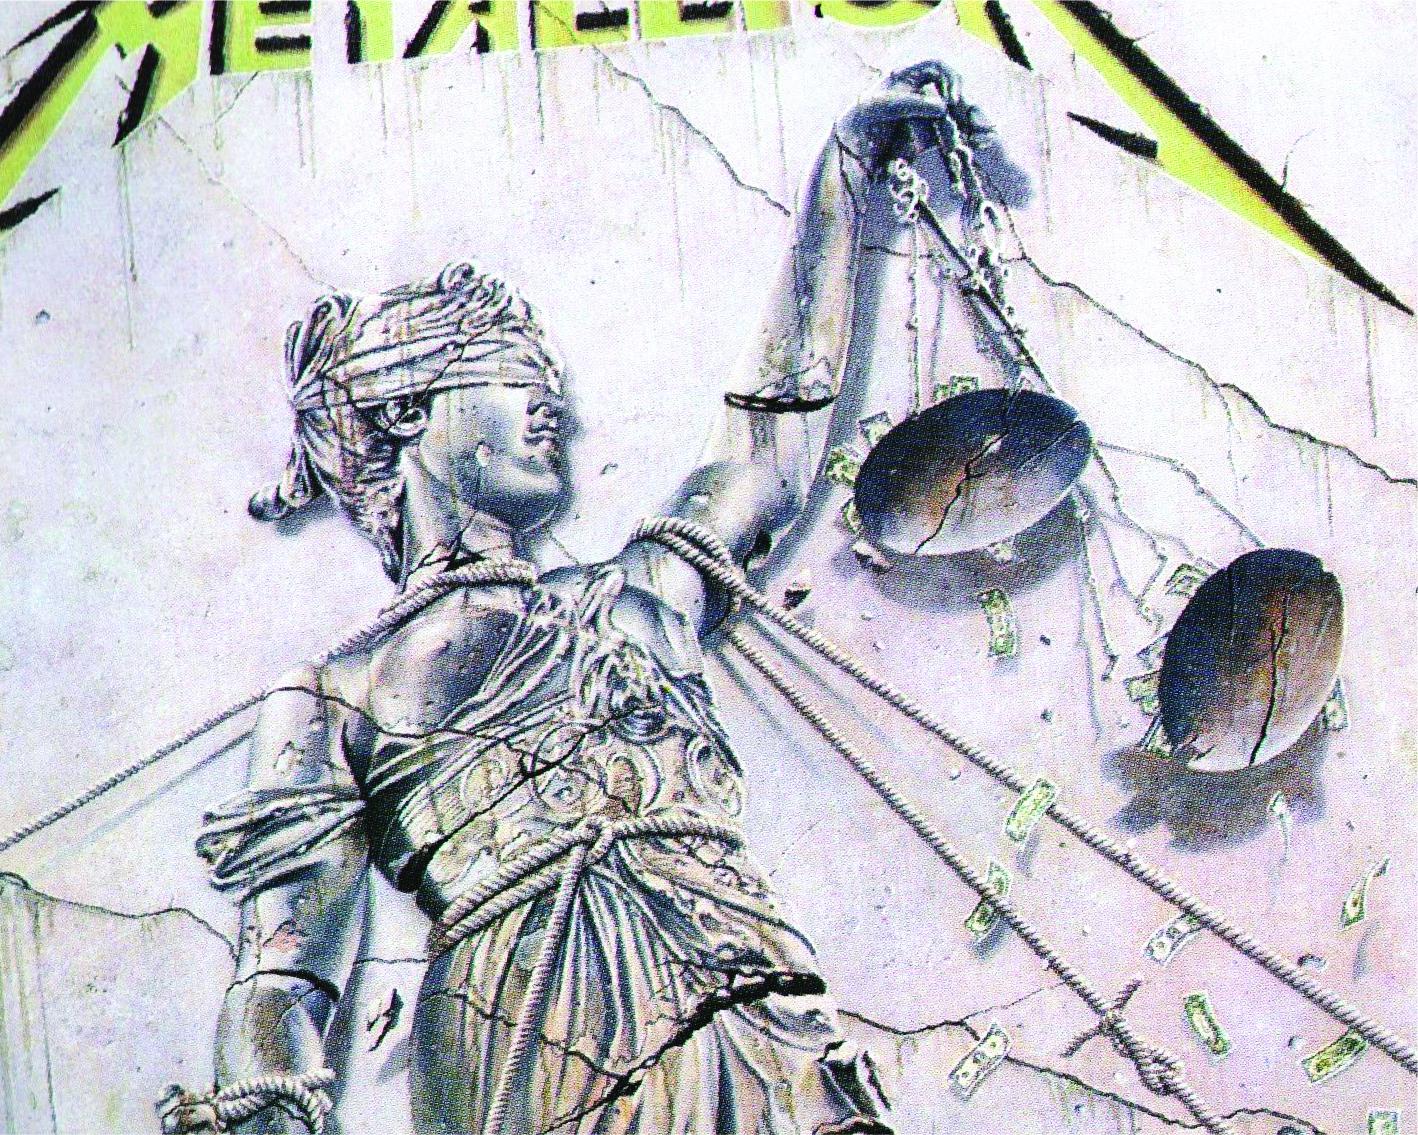 Metallica 1-4-02